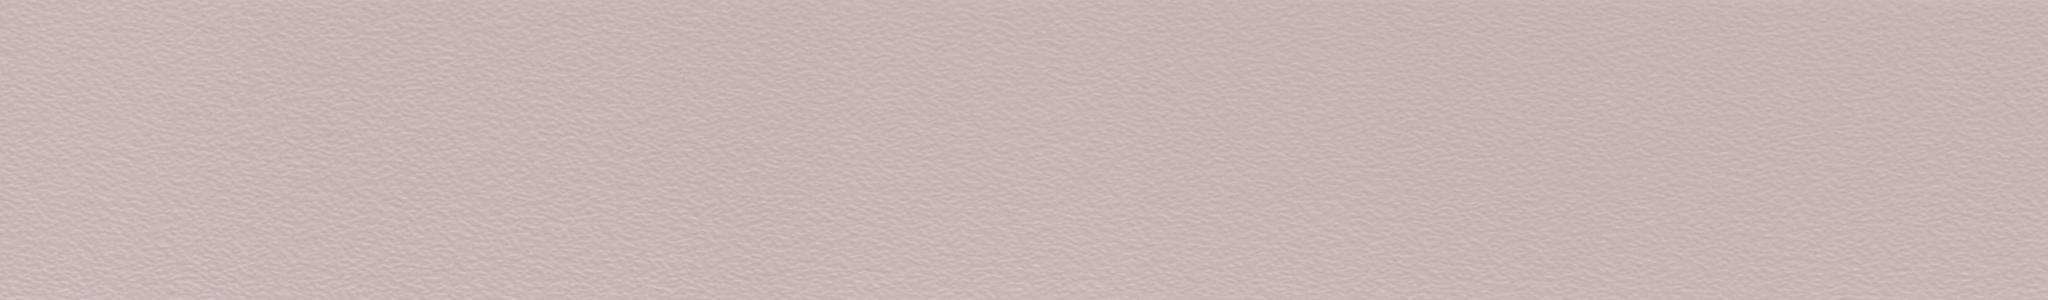 HU 13325 ABS Edge Pink Pearl XG